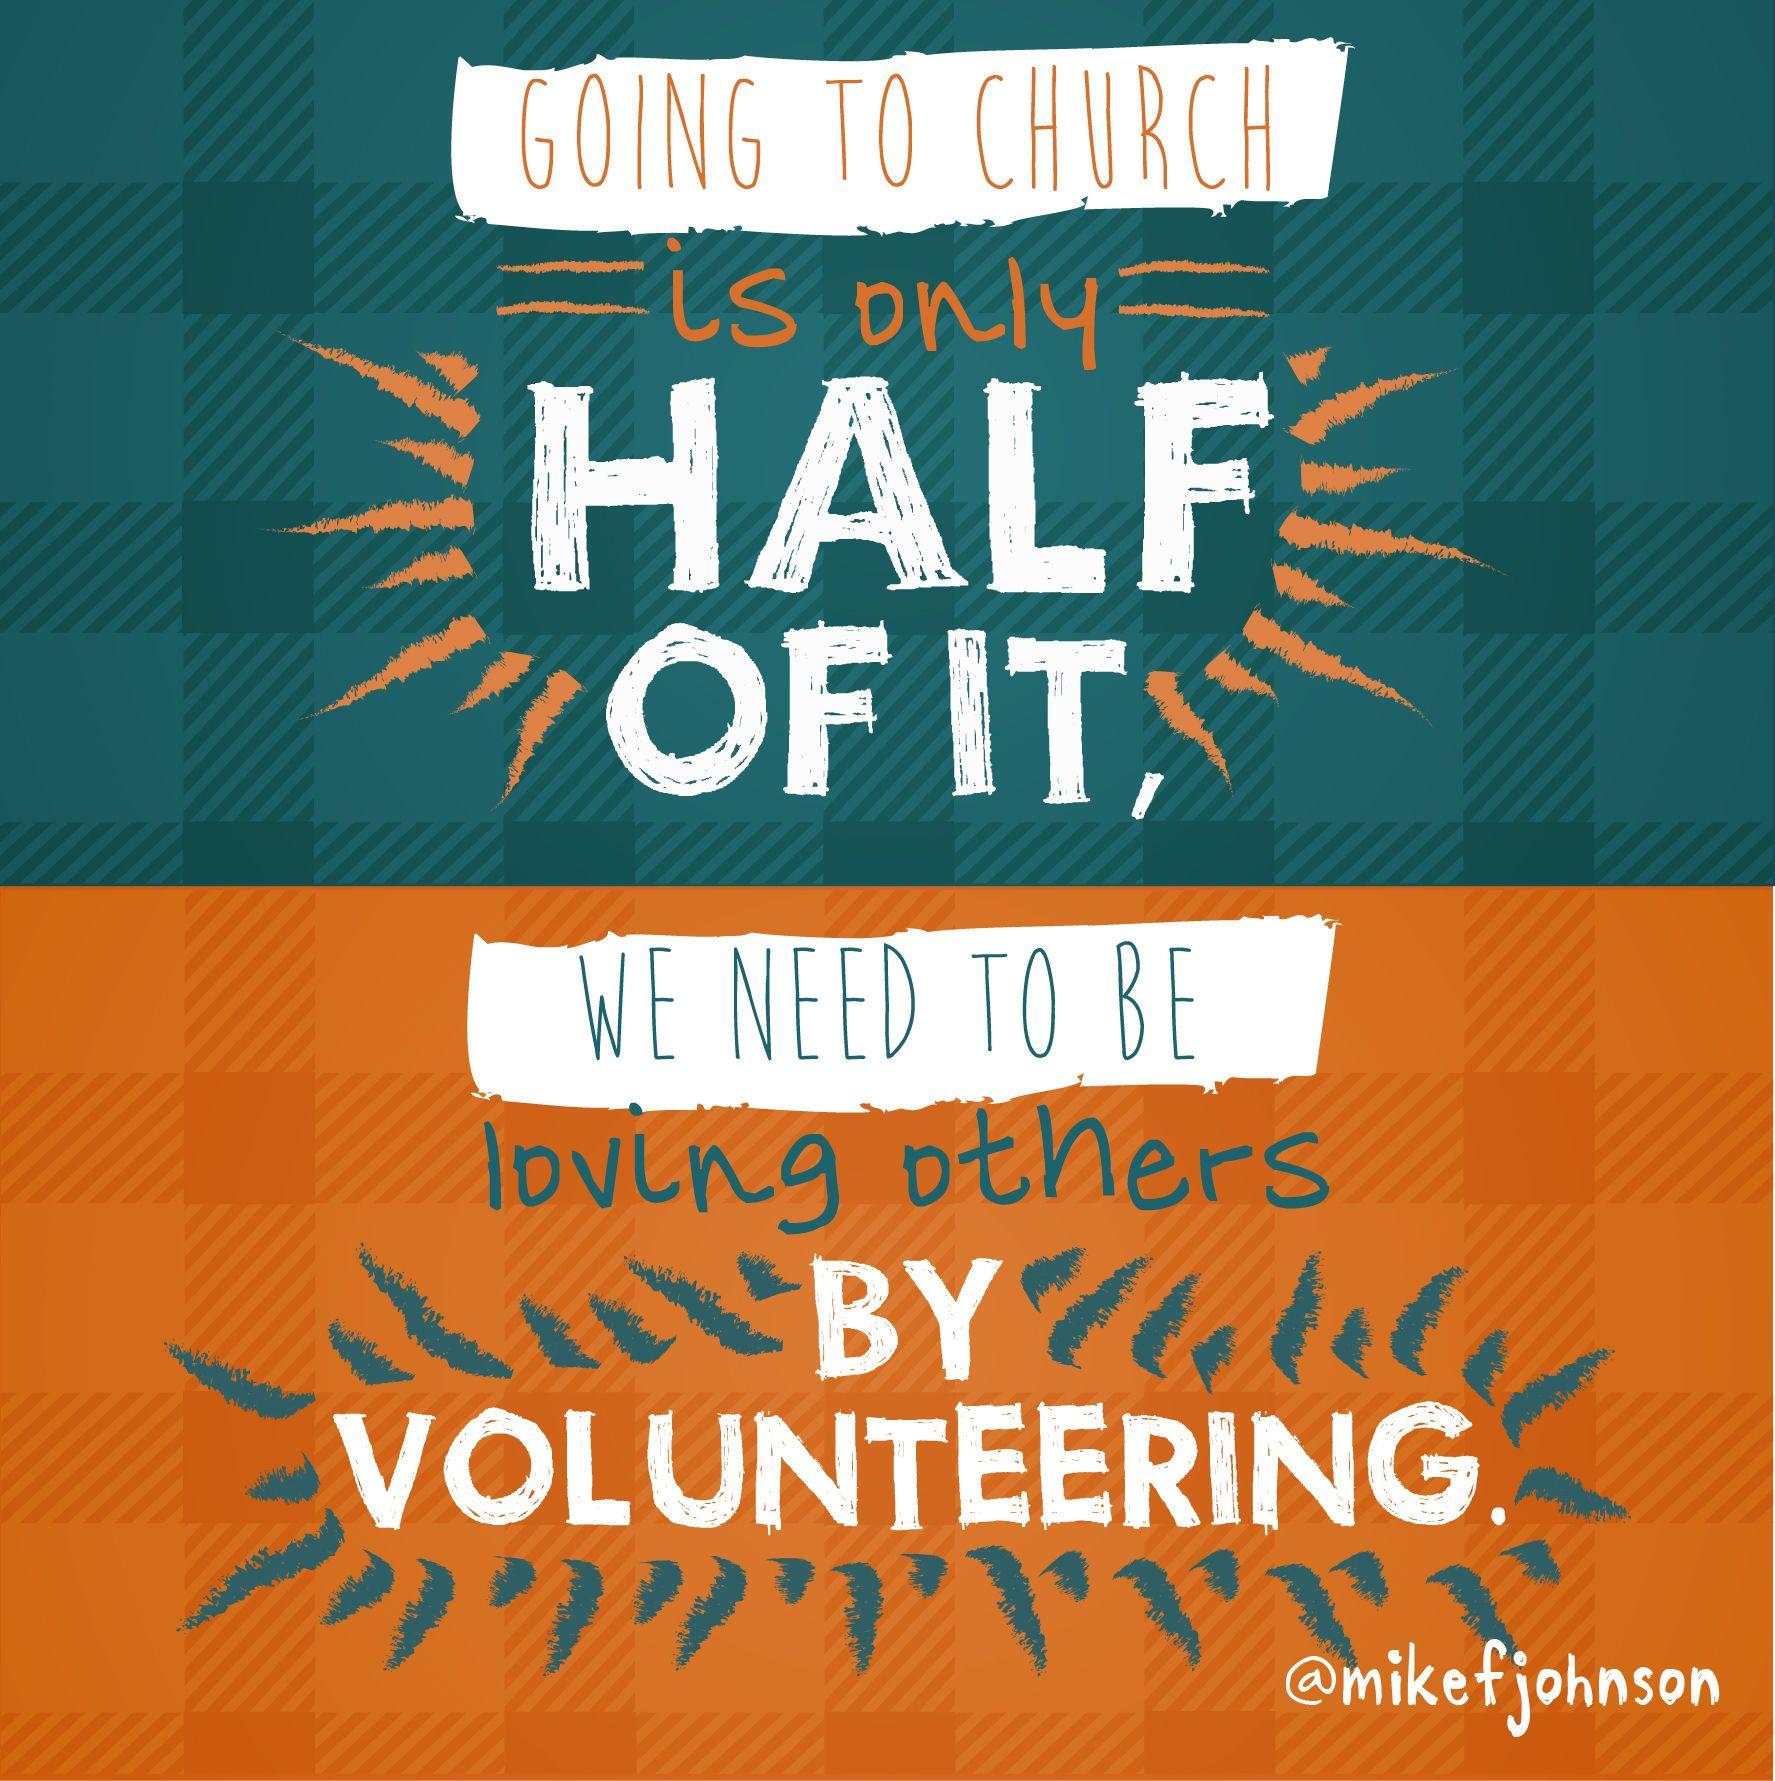 Quotes On Volunteering Love Othersvolunteering  Now That's A Good Idea  Pinterest